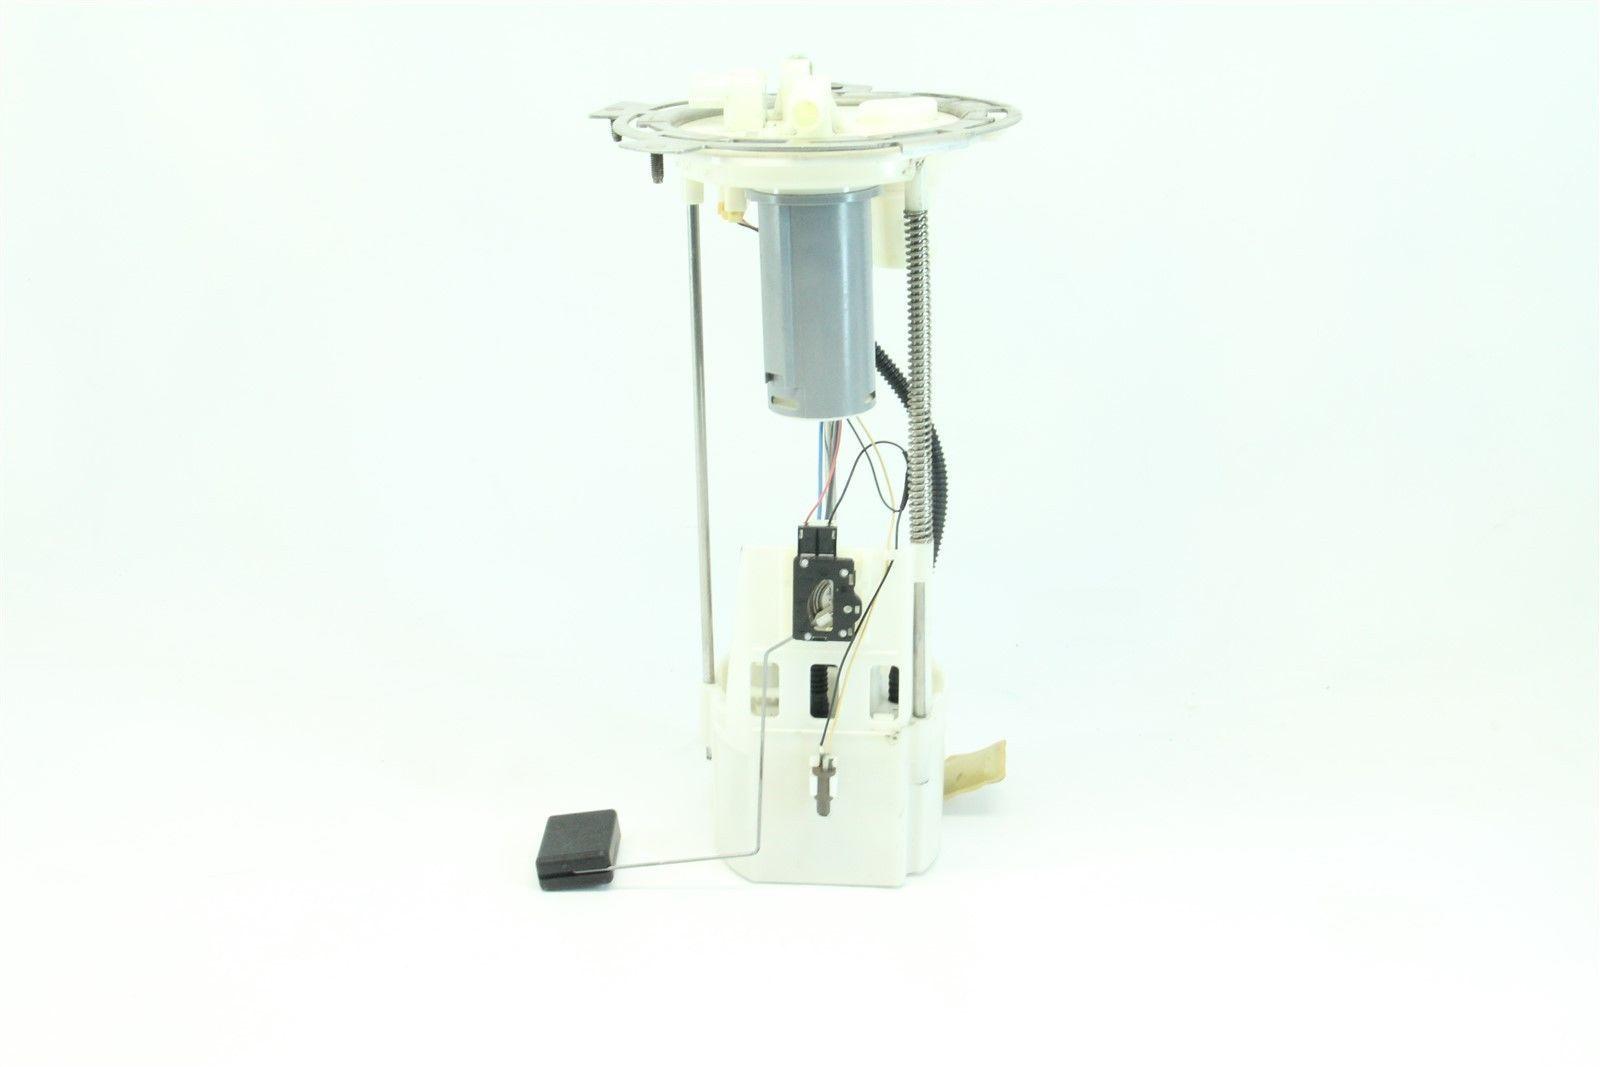 Infiniti Qx56 Fuel Filter Gas Pump 17040 Zq60a 04 05 06 07 Extreme